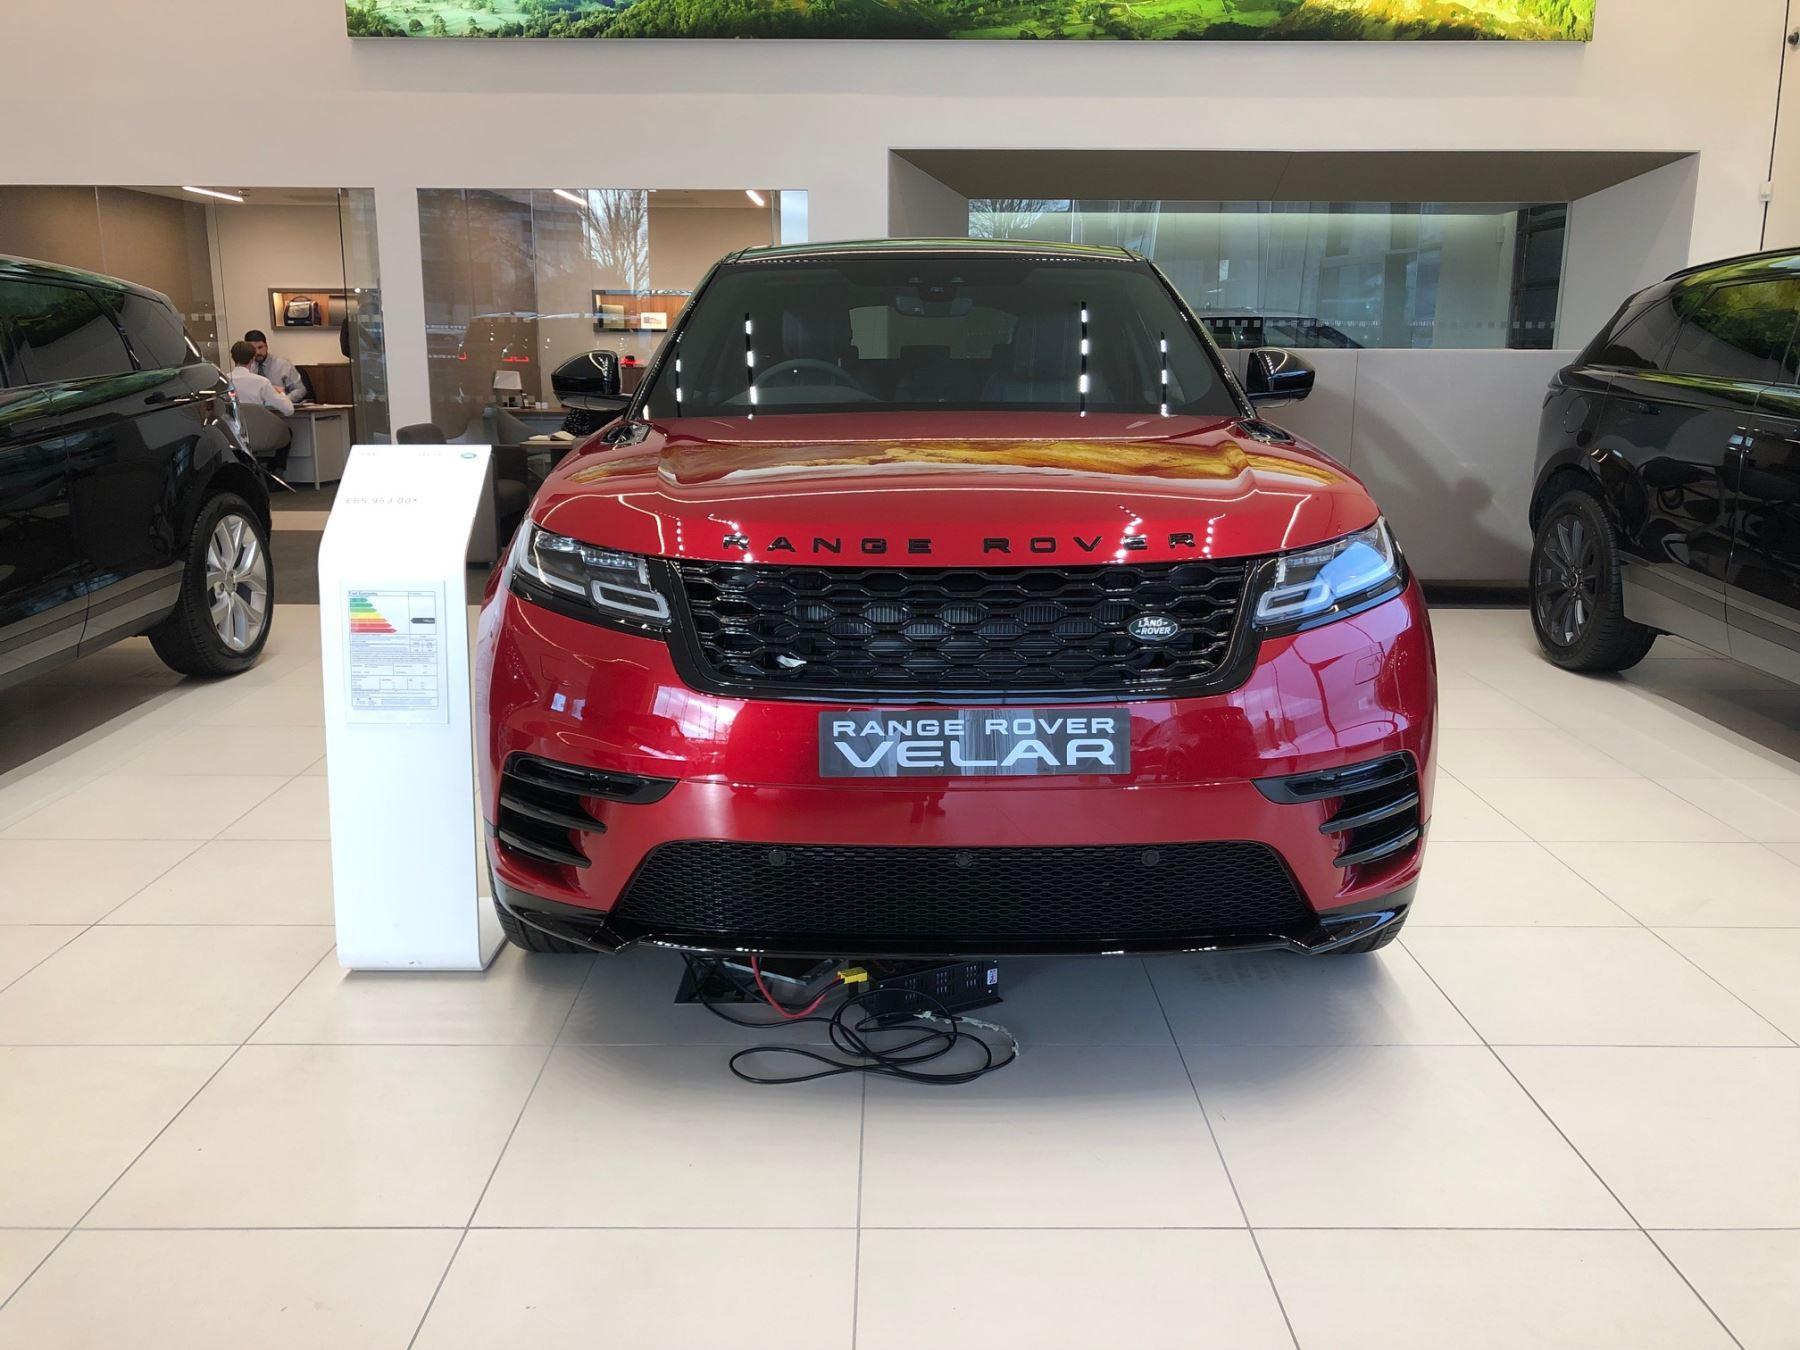 Land Rover Range Rover Velar 2.0 D240 R-Dynamic SE Diesel Automatic 5 door Estate (19MY)